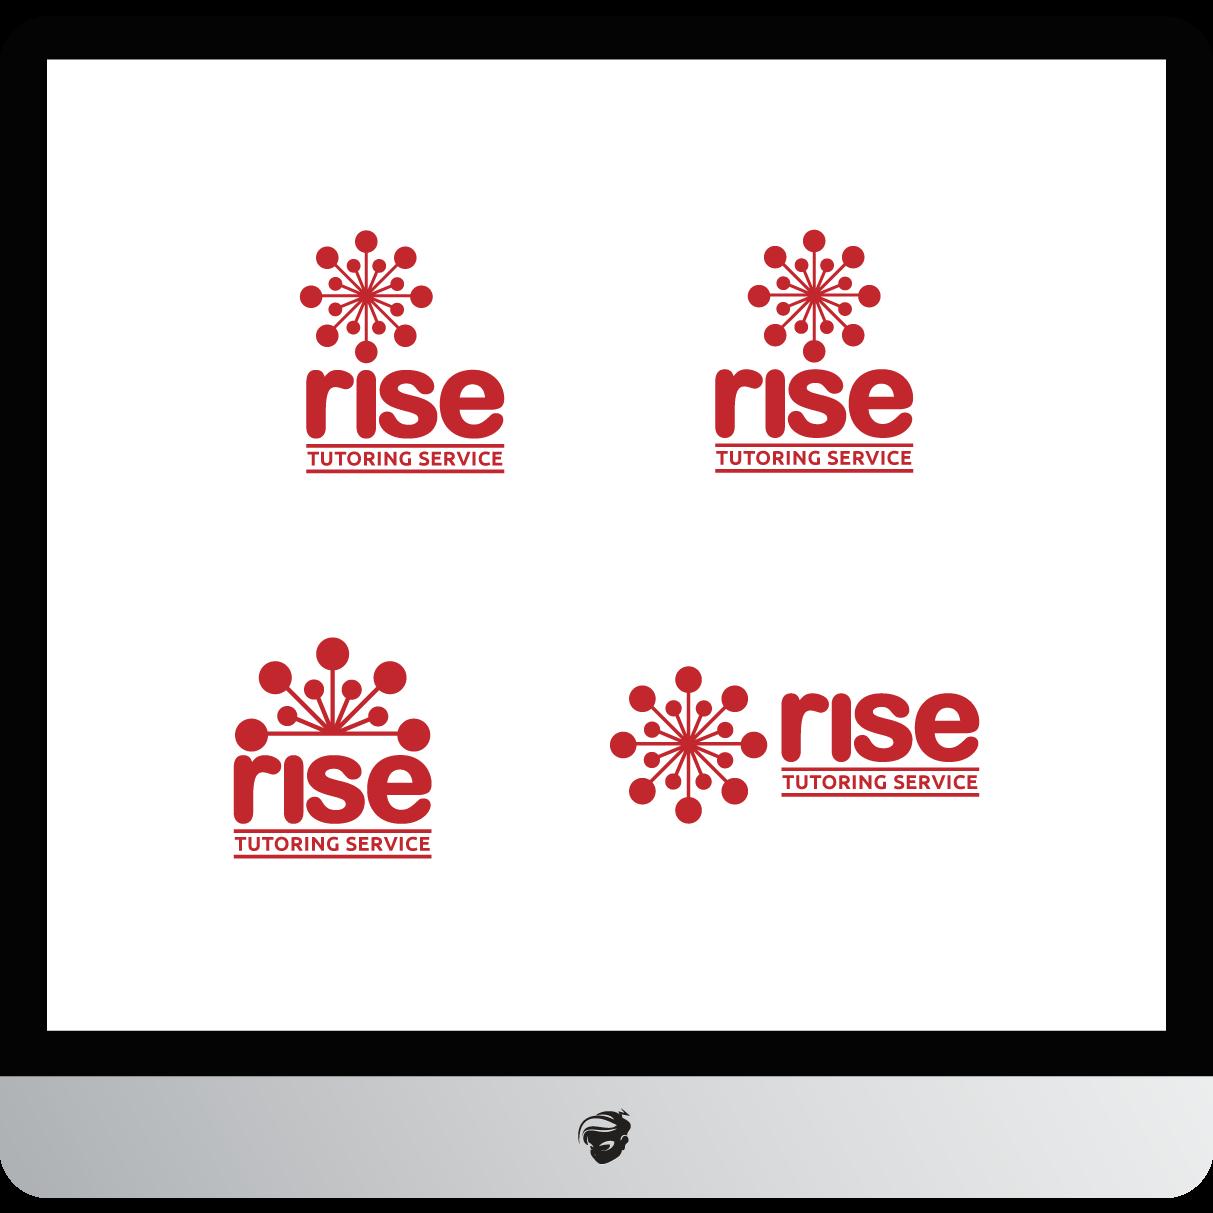 Logo Design by zesthar - Entry No. 240 in the Logo Design Contest Imaginative Logo Design for Rise Tutoring Service.